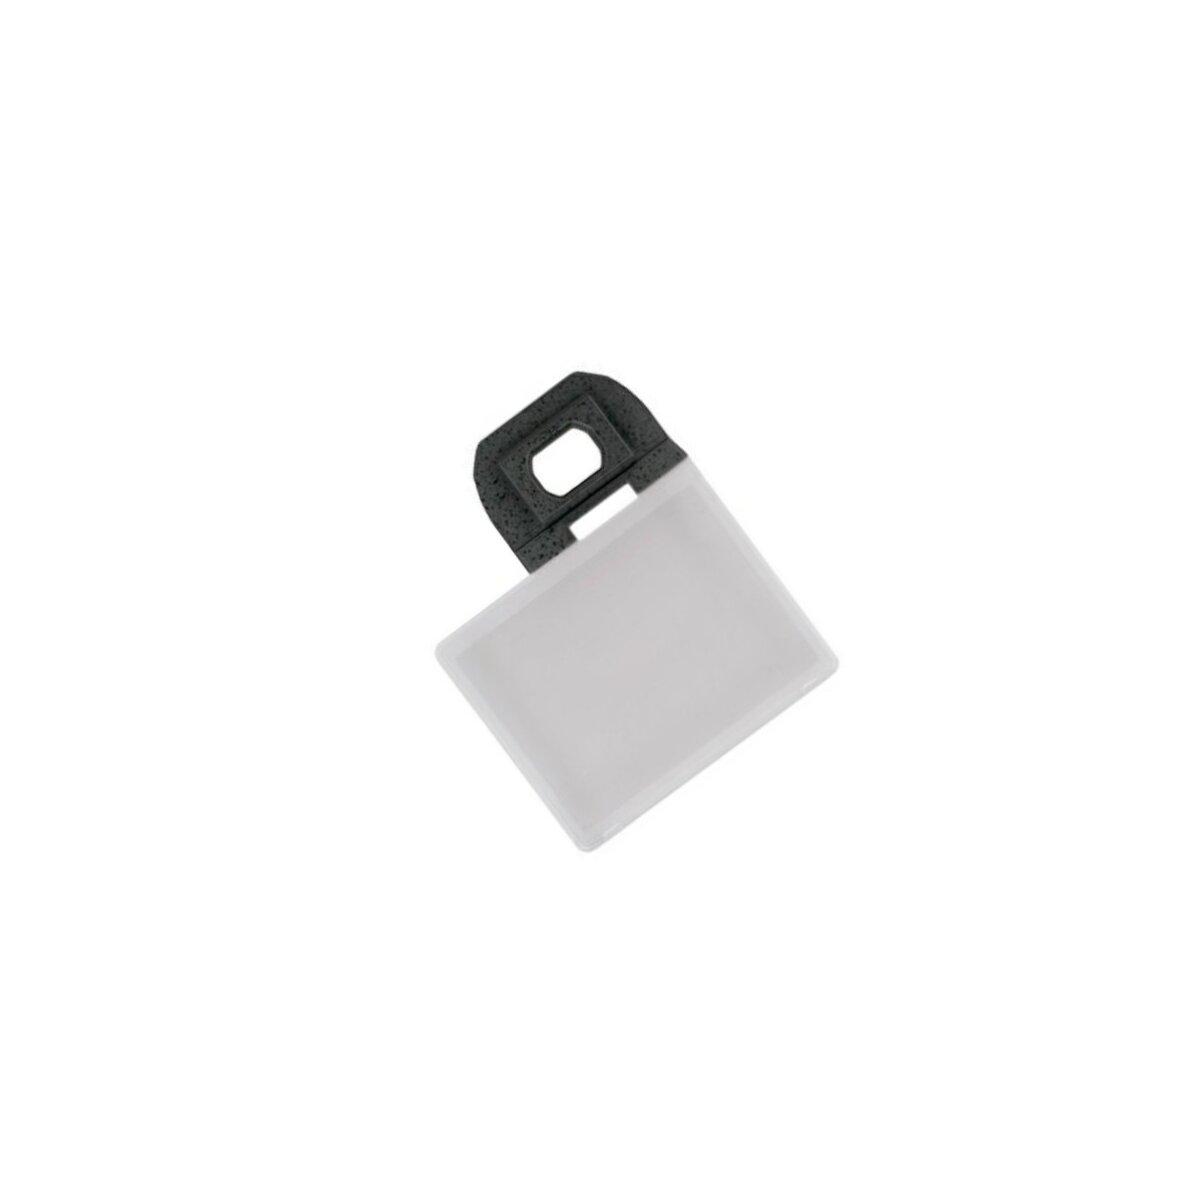 Displayschutz kompatibel mit Canon EOS 7D - LCD ** Monitorschutz - Schutzabdeckung- Cover- Bildschirmschutz-Monitorschutzkappe